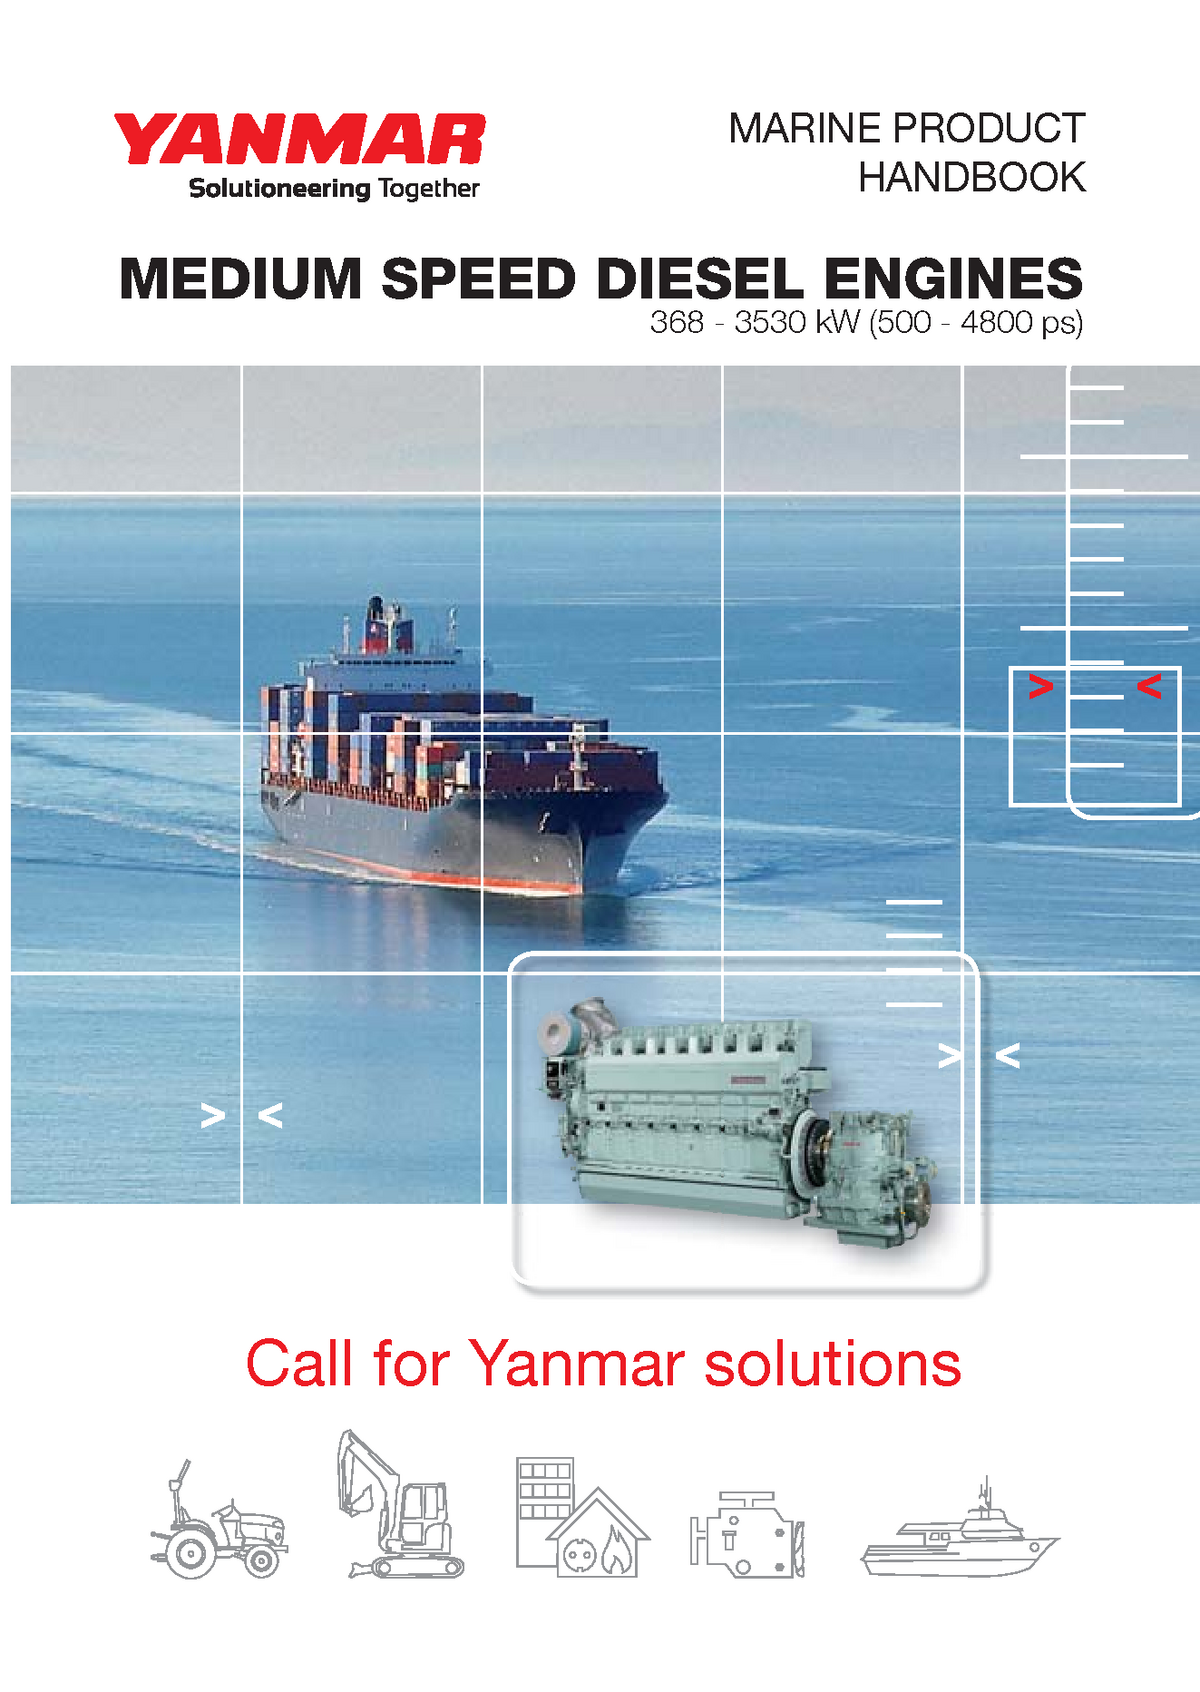 Yanmar marine medium speed catalog - Heat Transfer - UNDIP